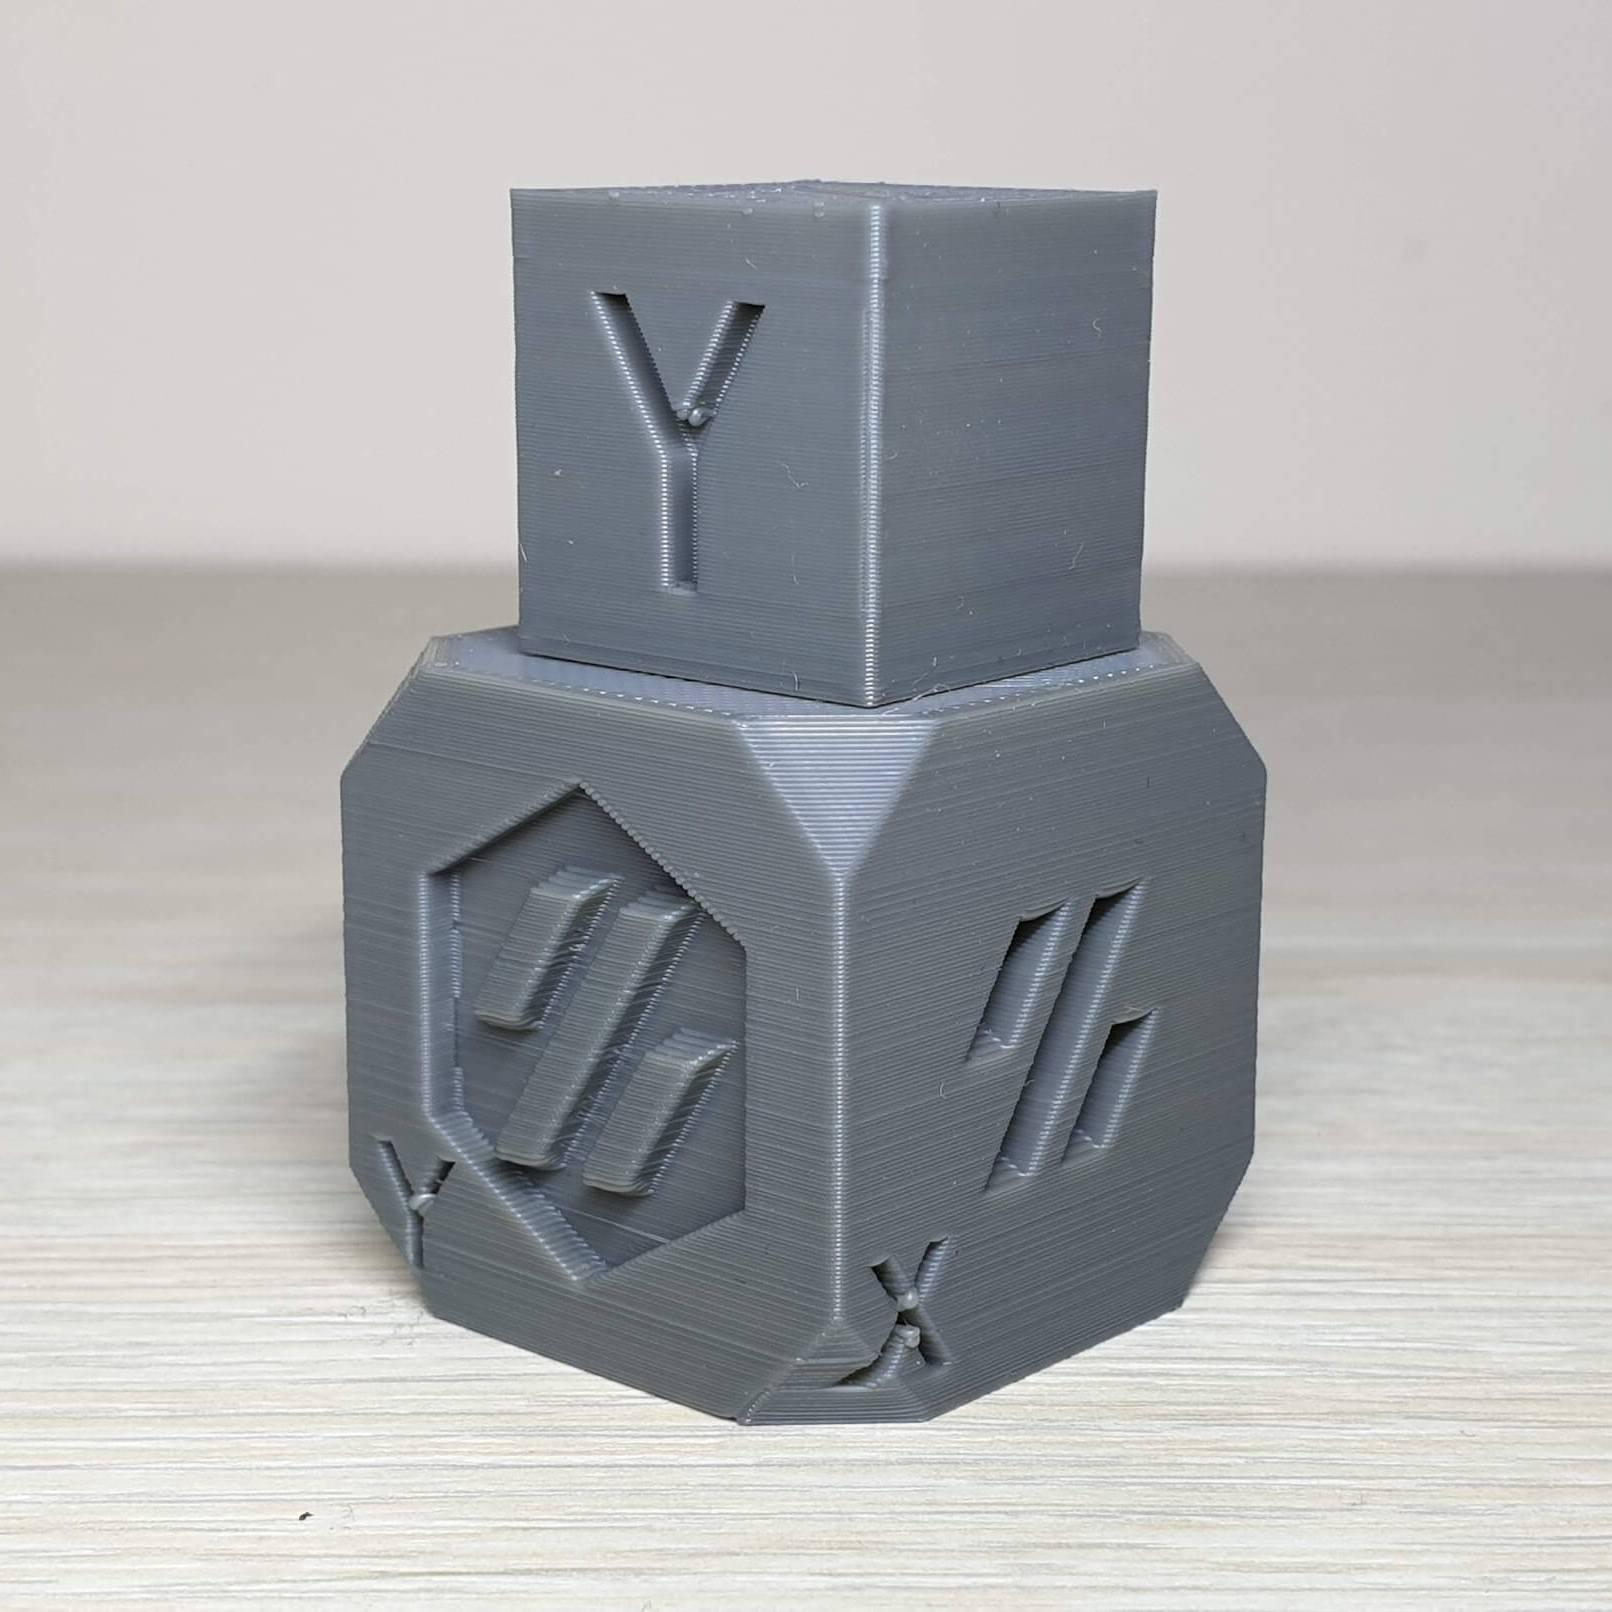 Ender 5 Plus First prints 2 | Creality Ender 5 Plus Review - Print Big!